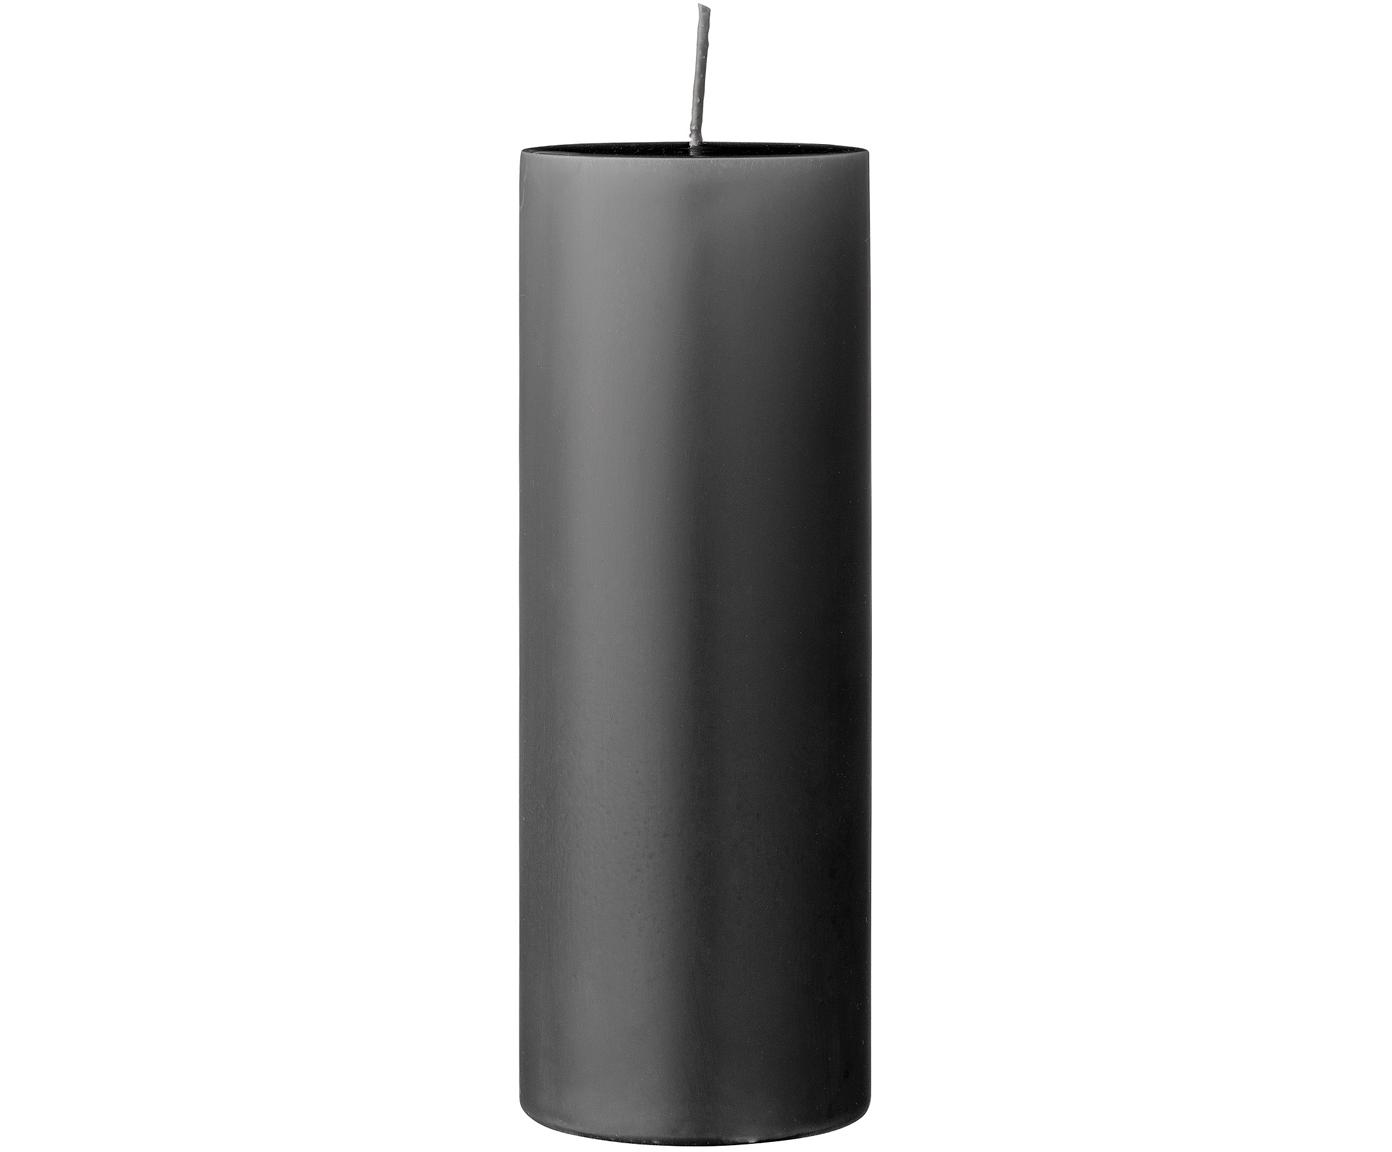 Stumpenkerze Lulu, Wachs, Grau, Ø 7 x H 20 cm